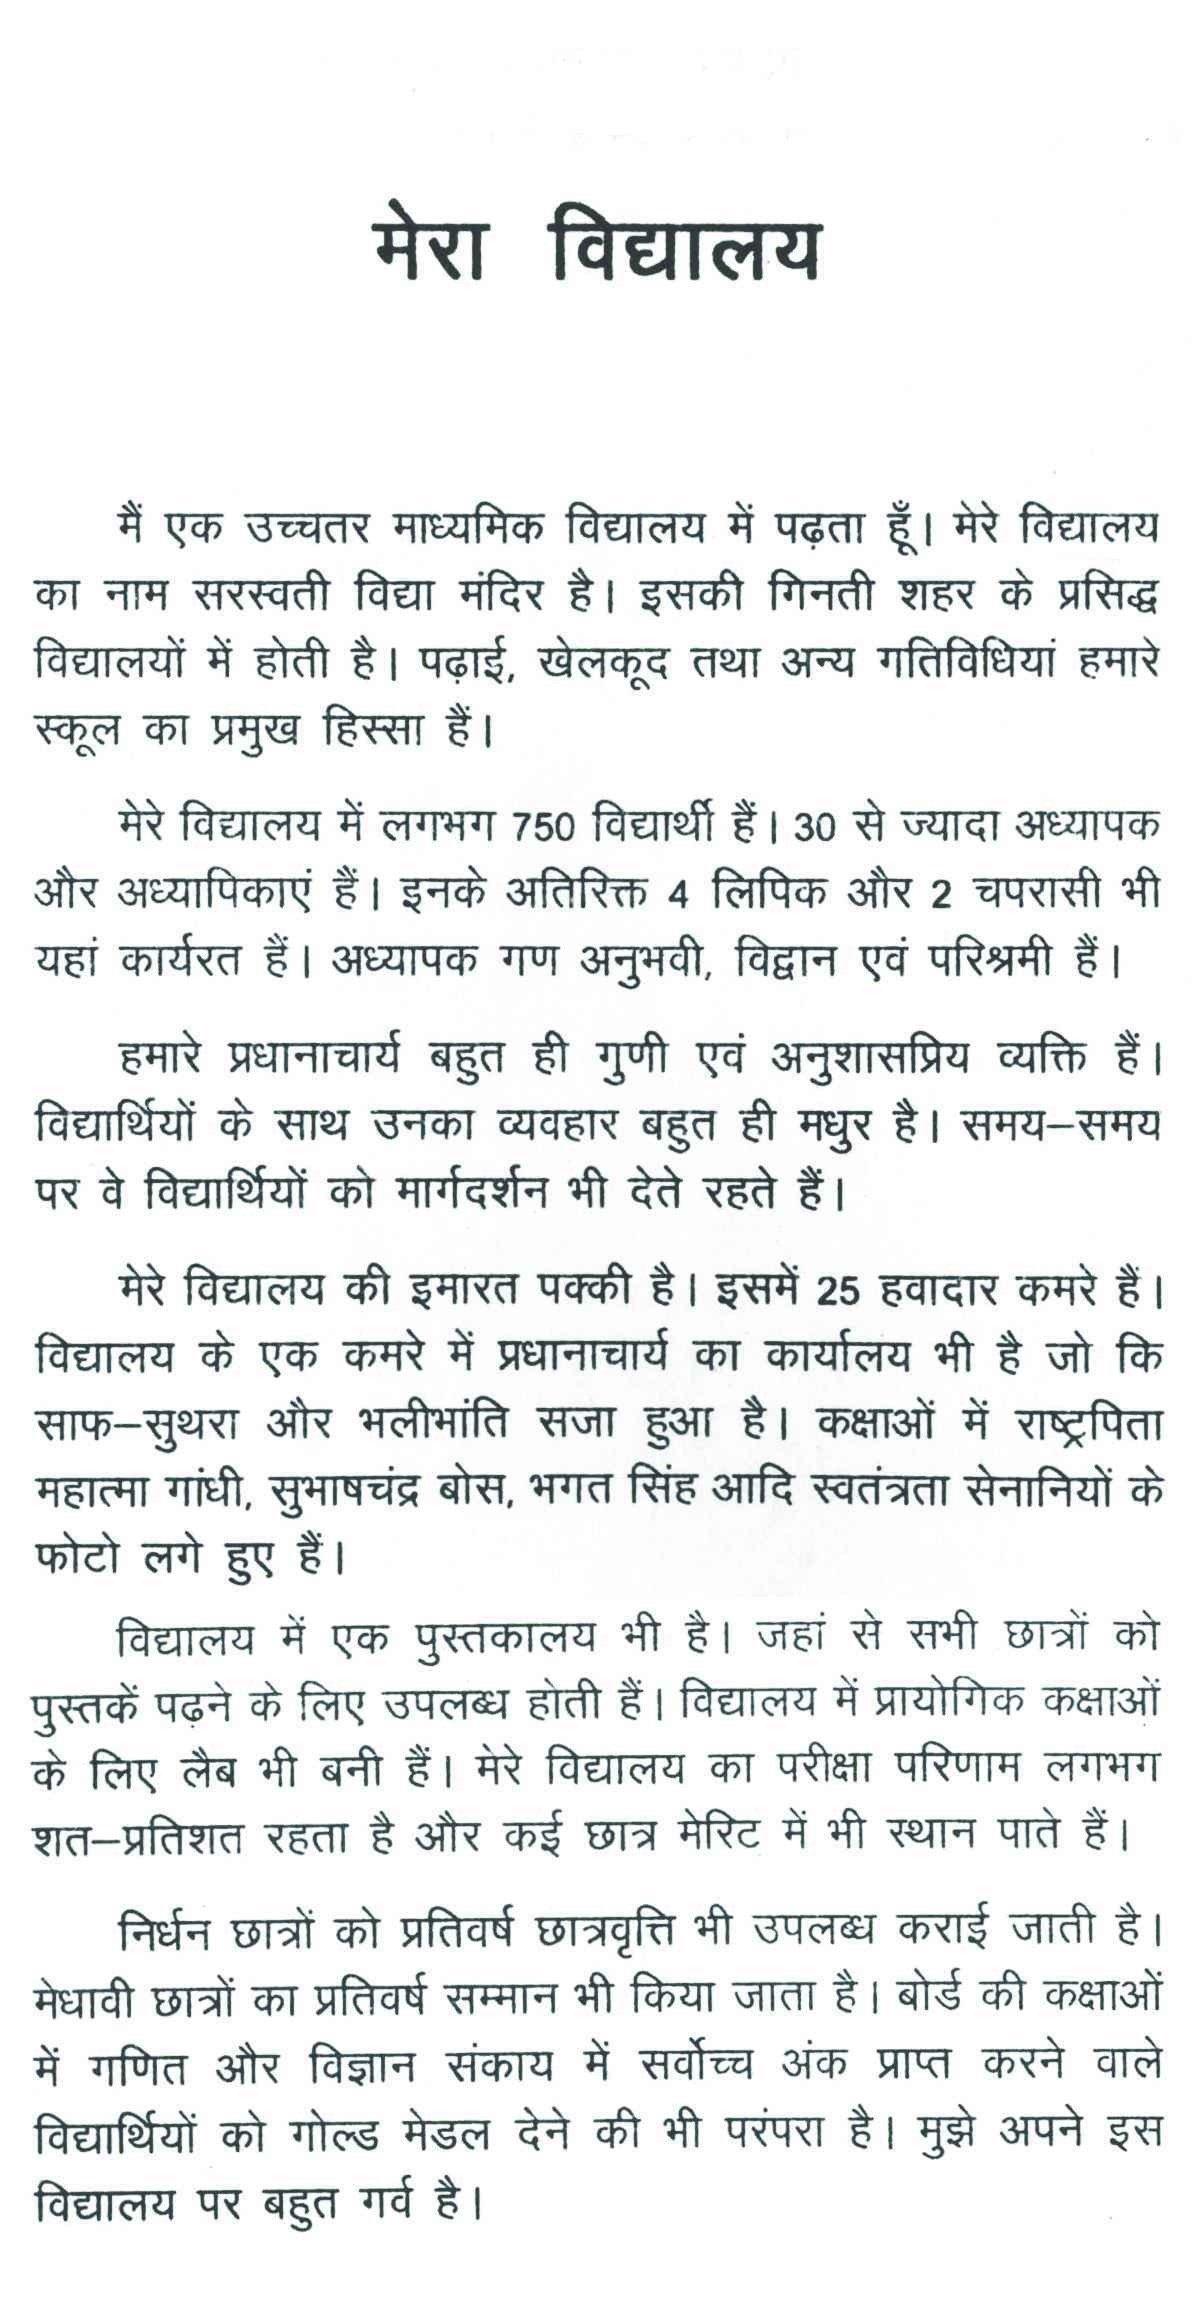 005 My School Essay O4mldyykxk Amazing Dream For Class 10 In Urdu 1 3 Marathi Full